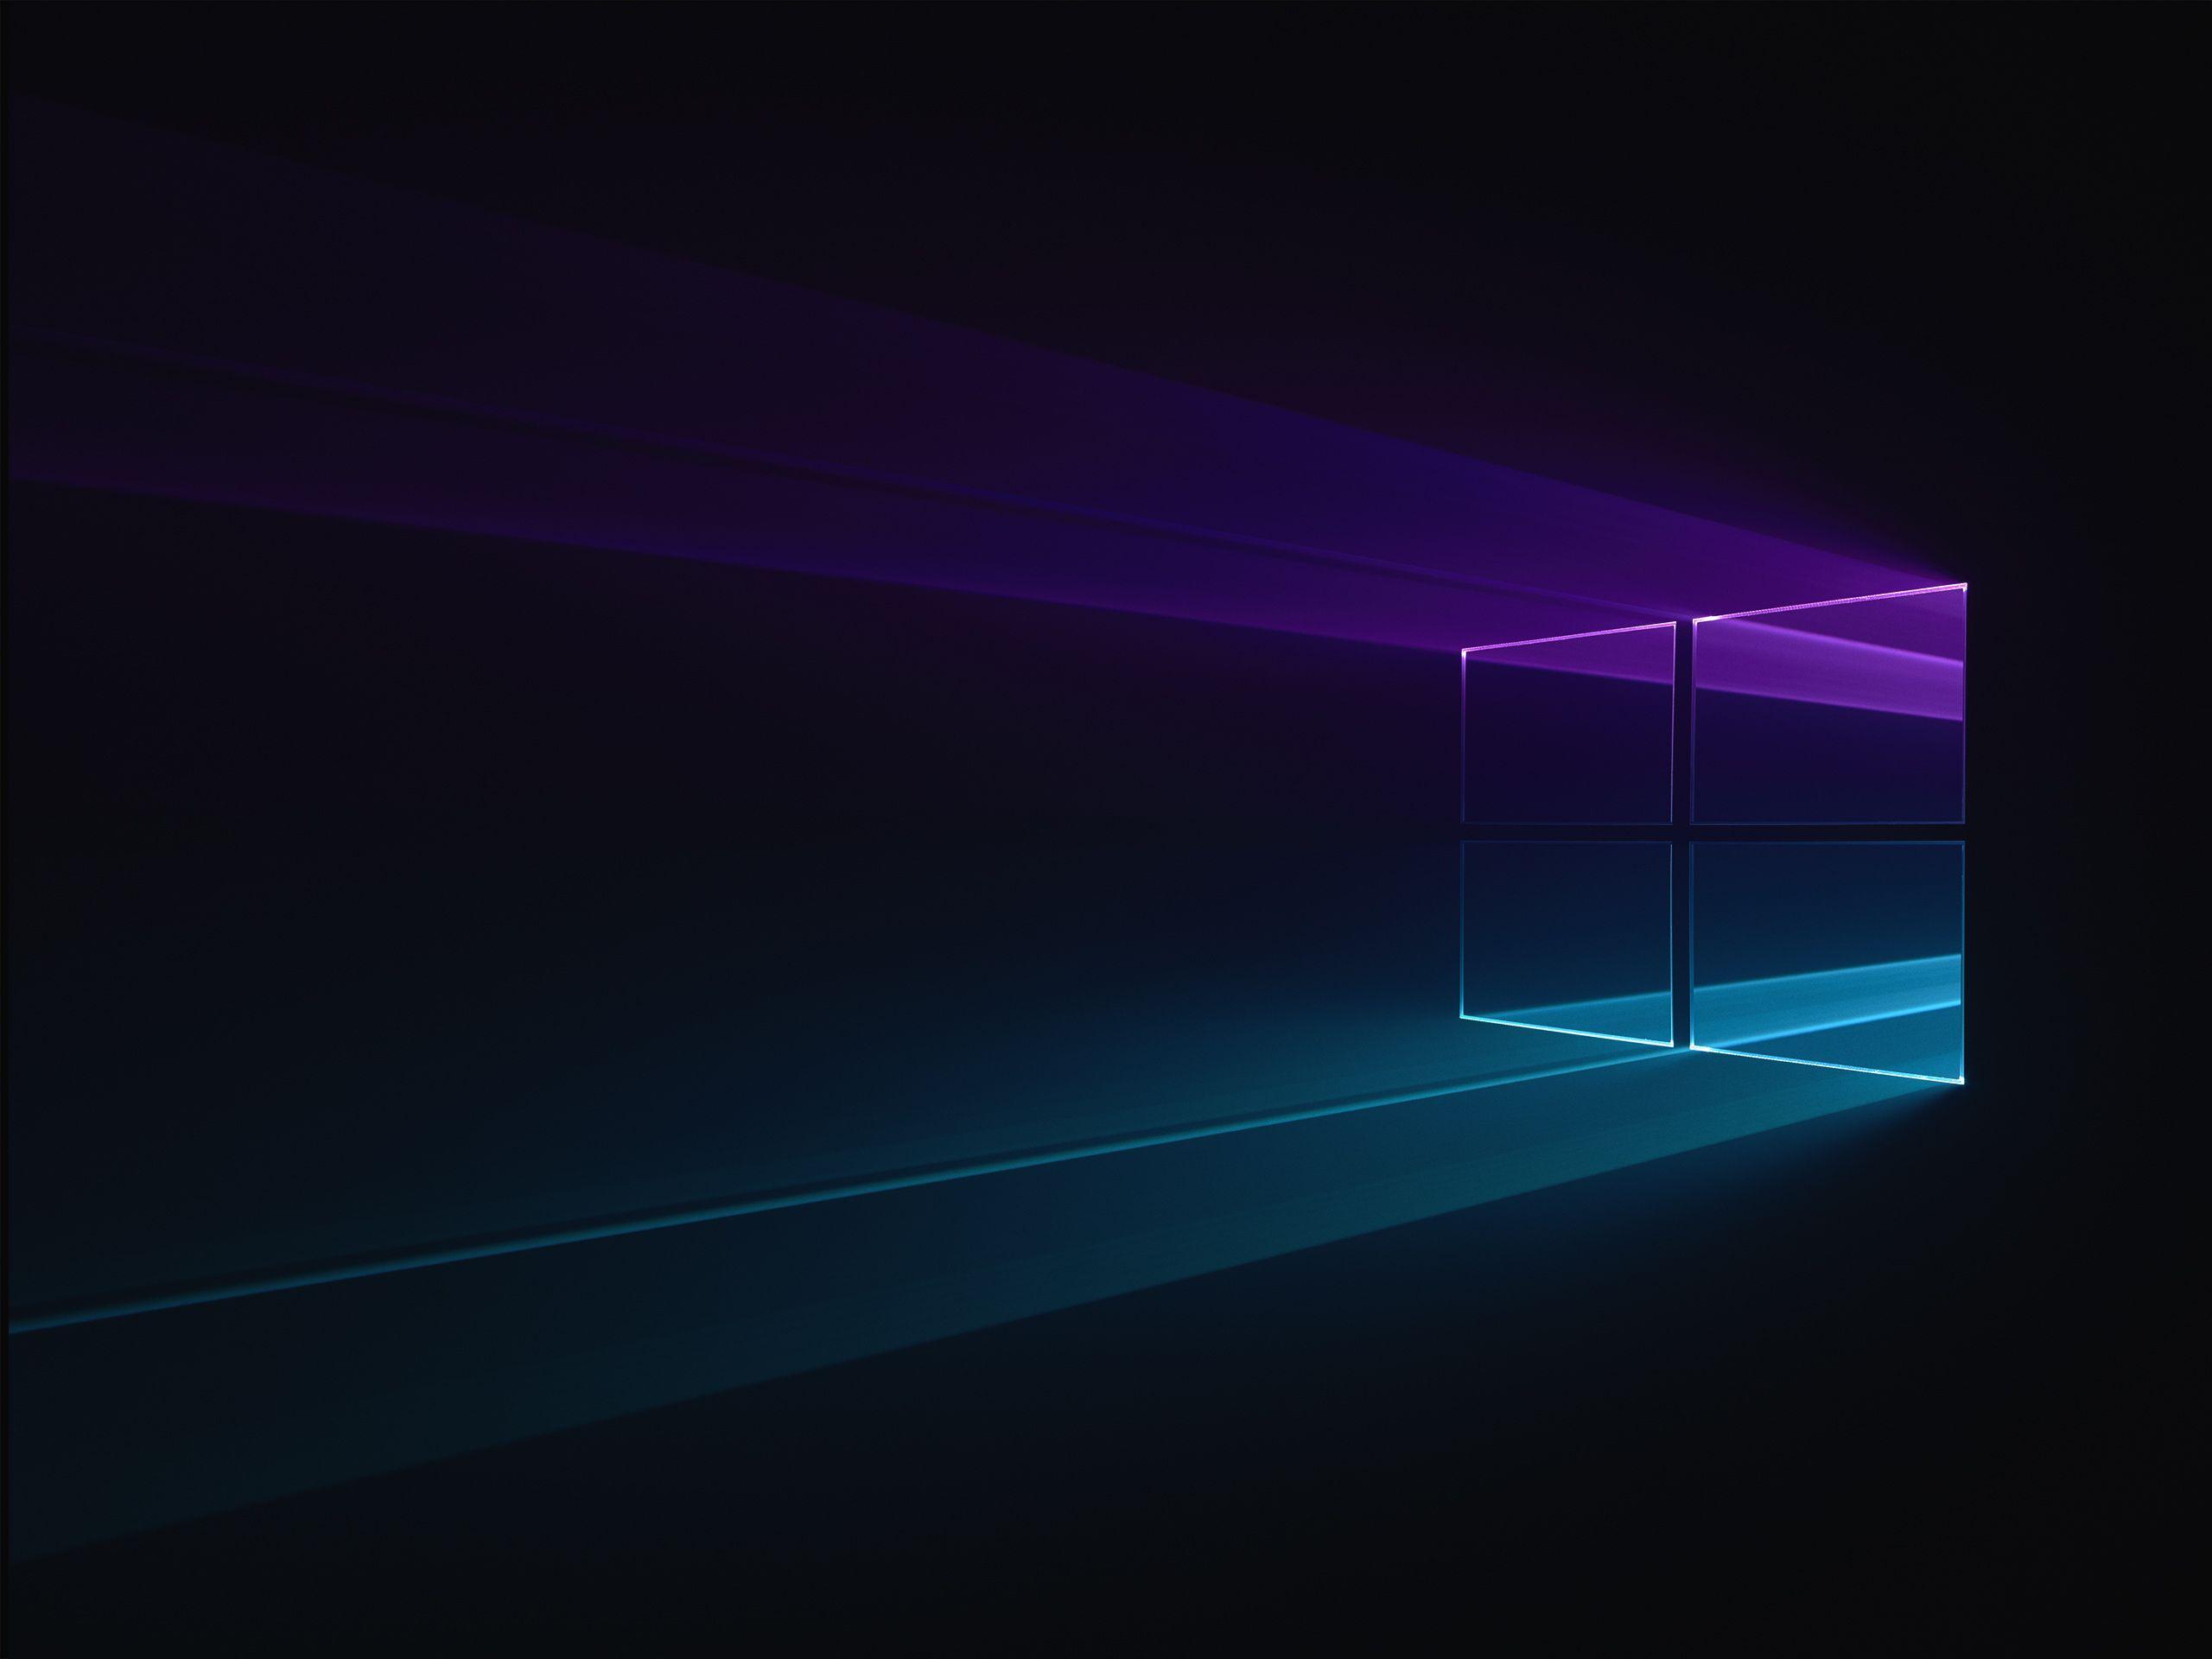 Windows 10 Redstone Wallpaper 4k